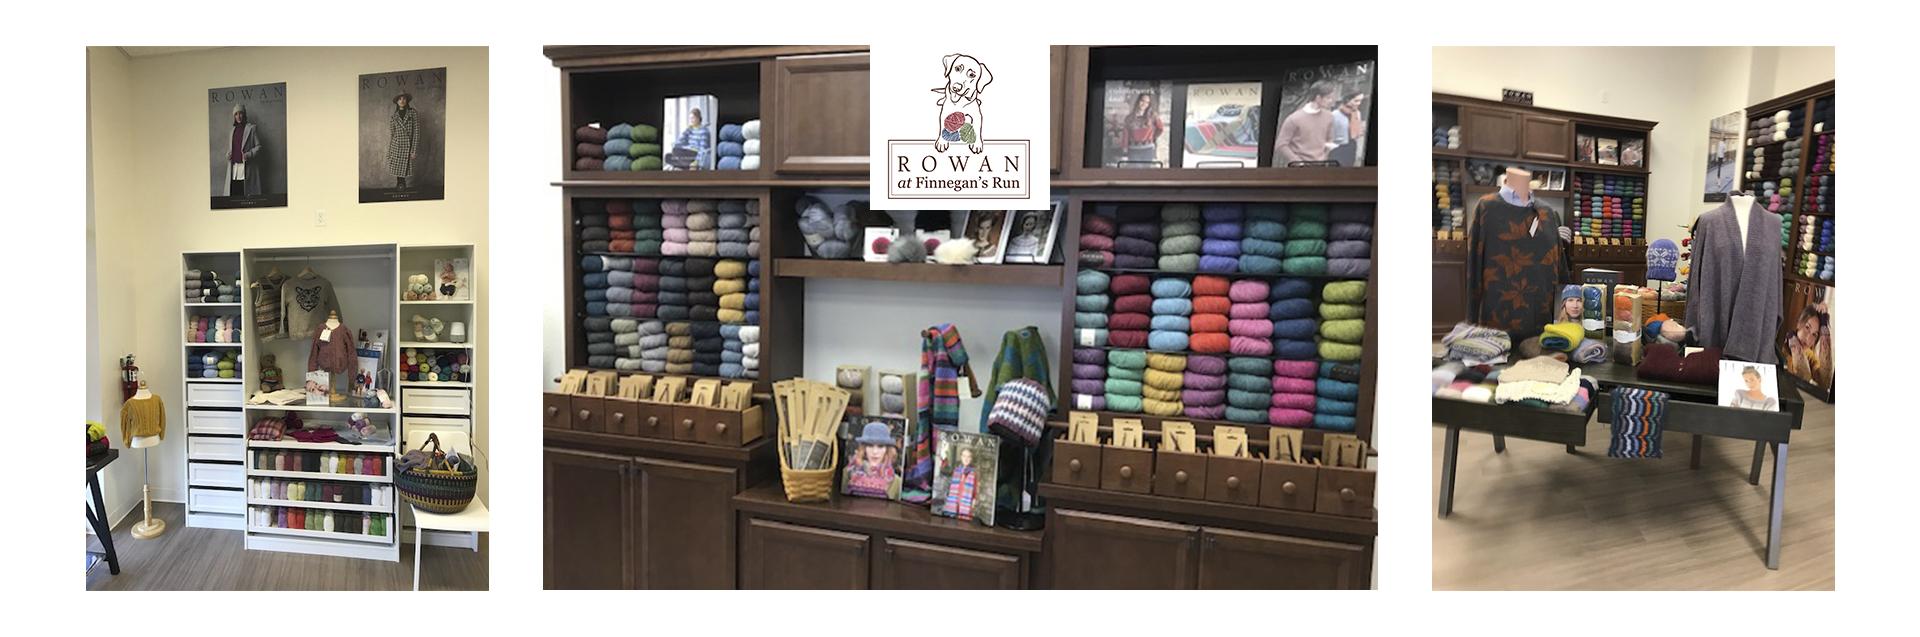 Located in Fredericksburg, VA, Rowan at Finnegan's Run is the only all Rowan yarn shop in North America.